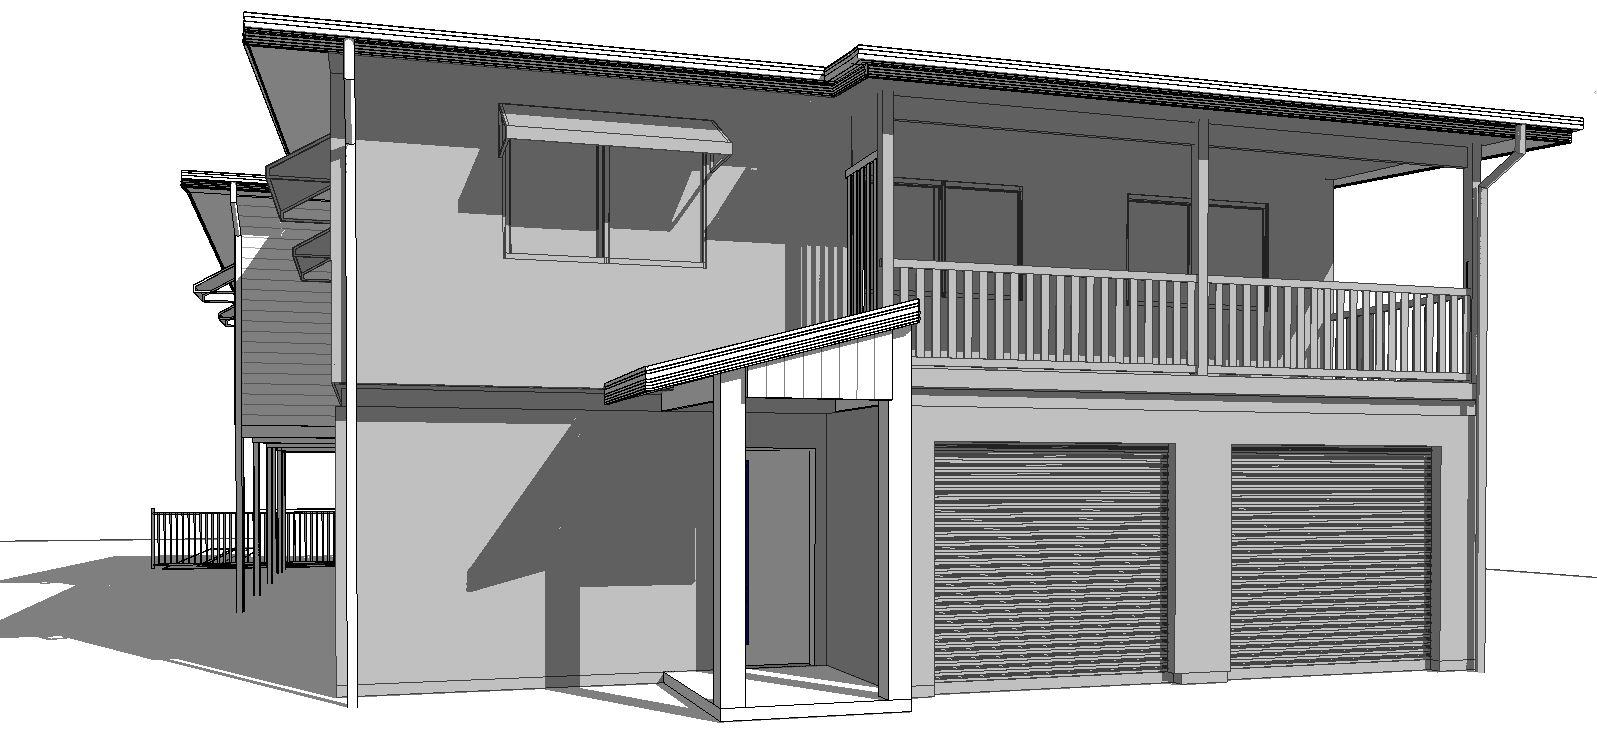 Jabiru Street Addition & Alteration -